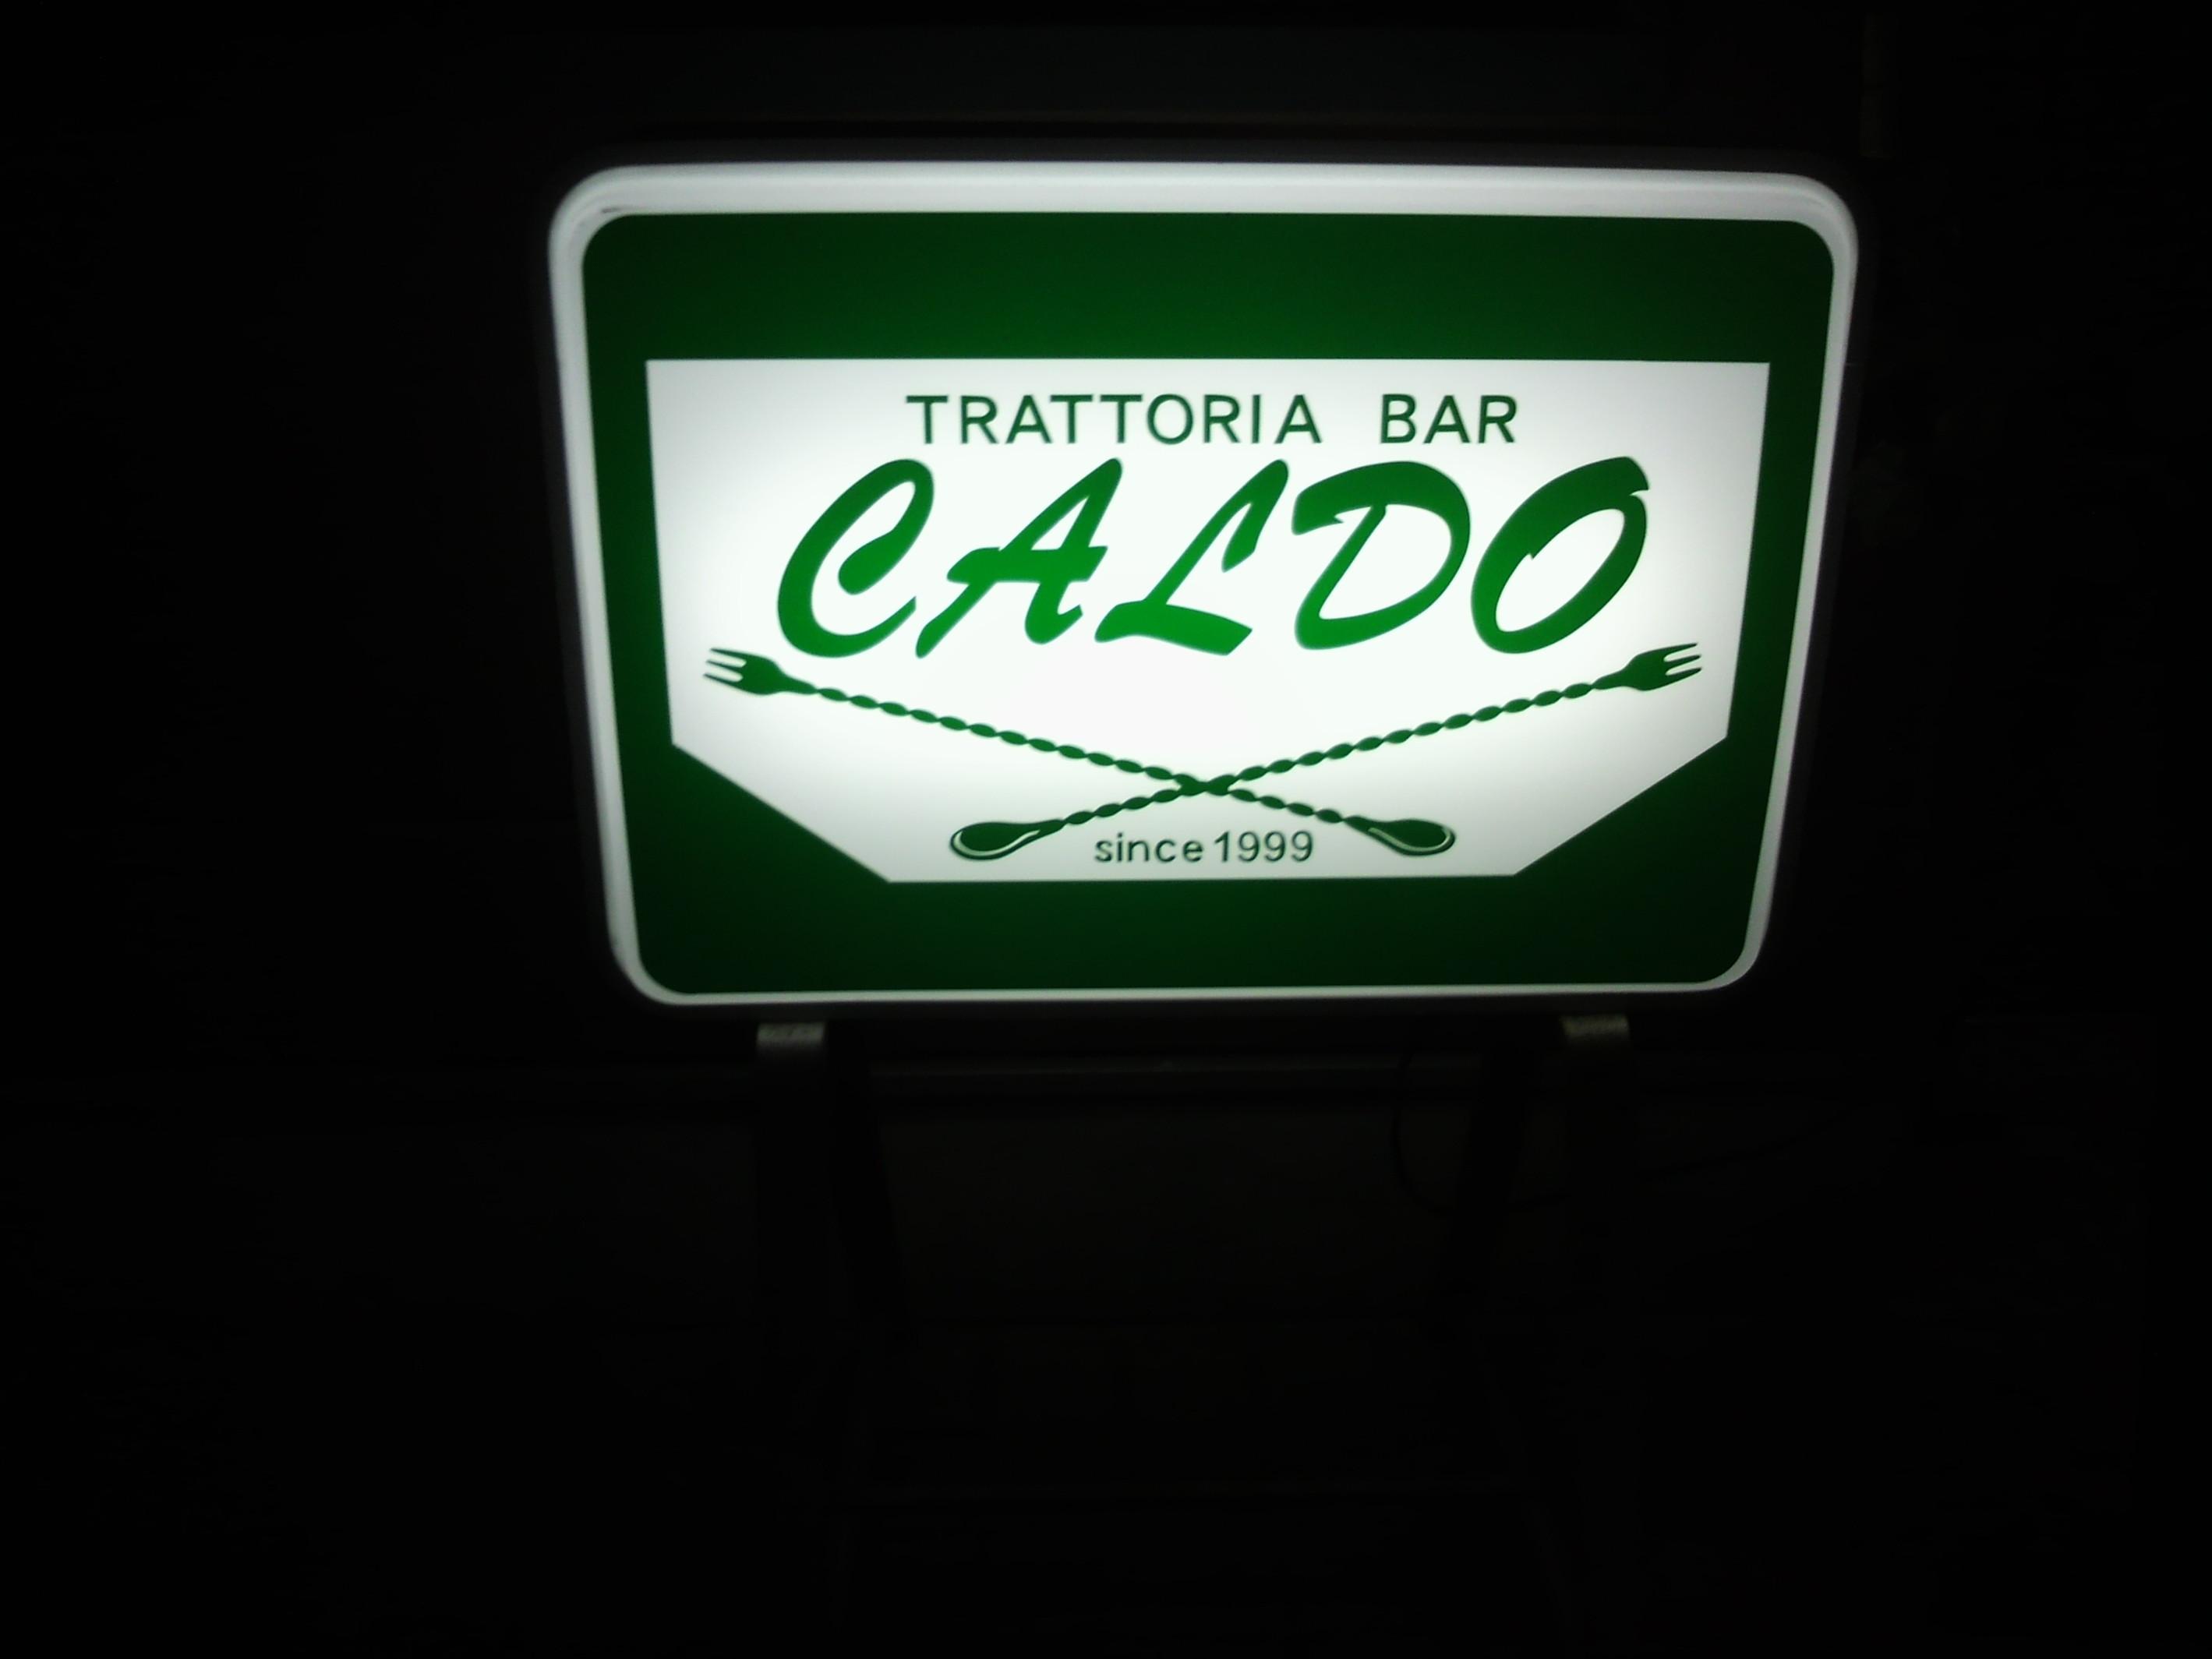 CALDO name=